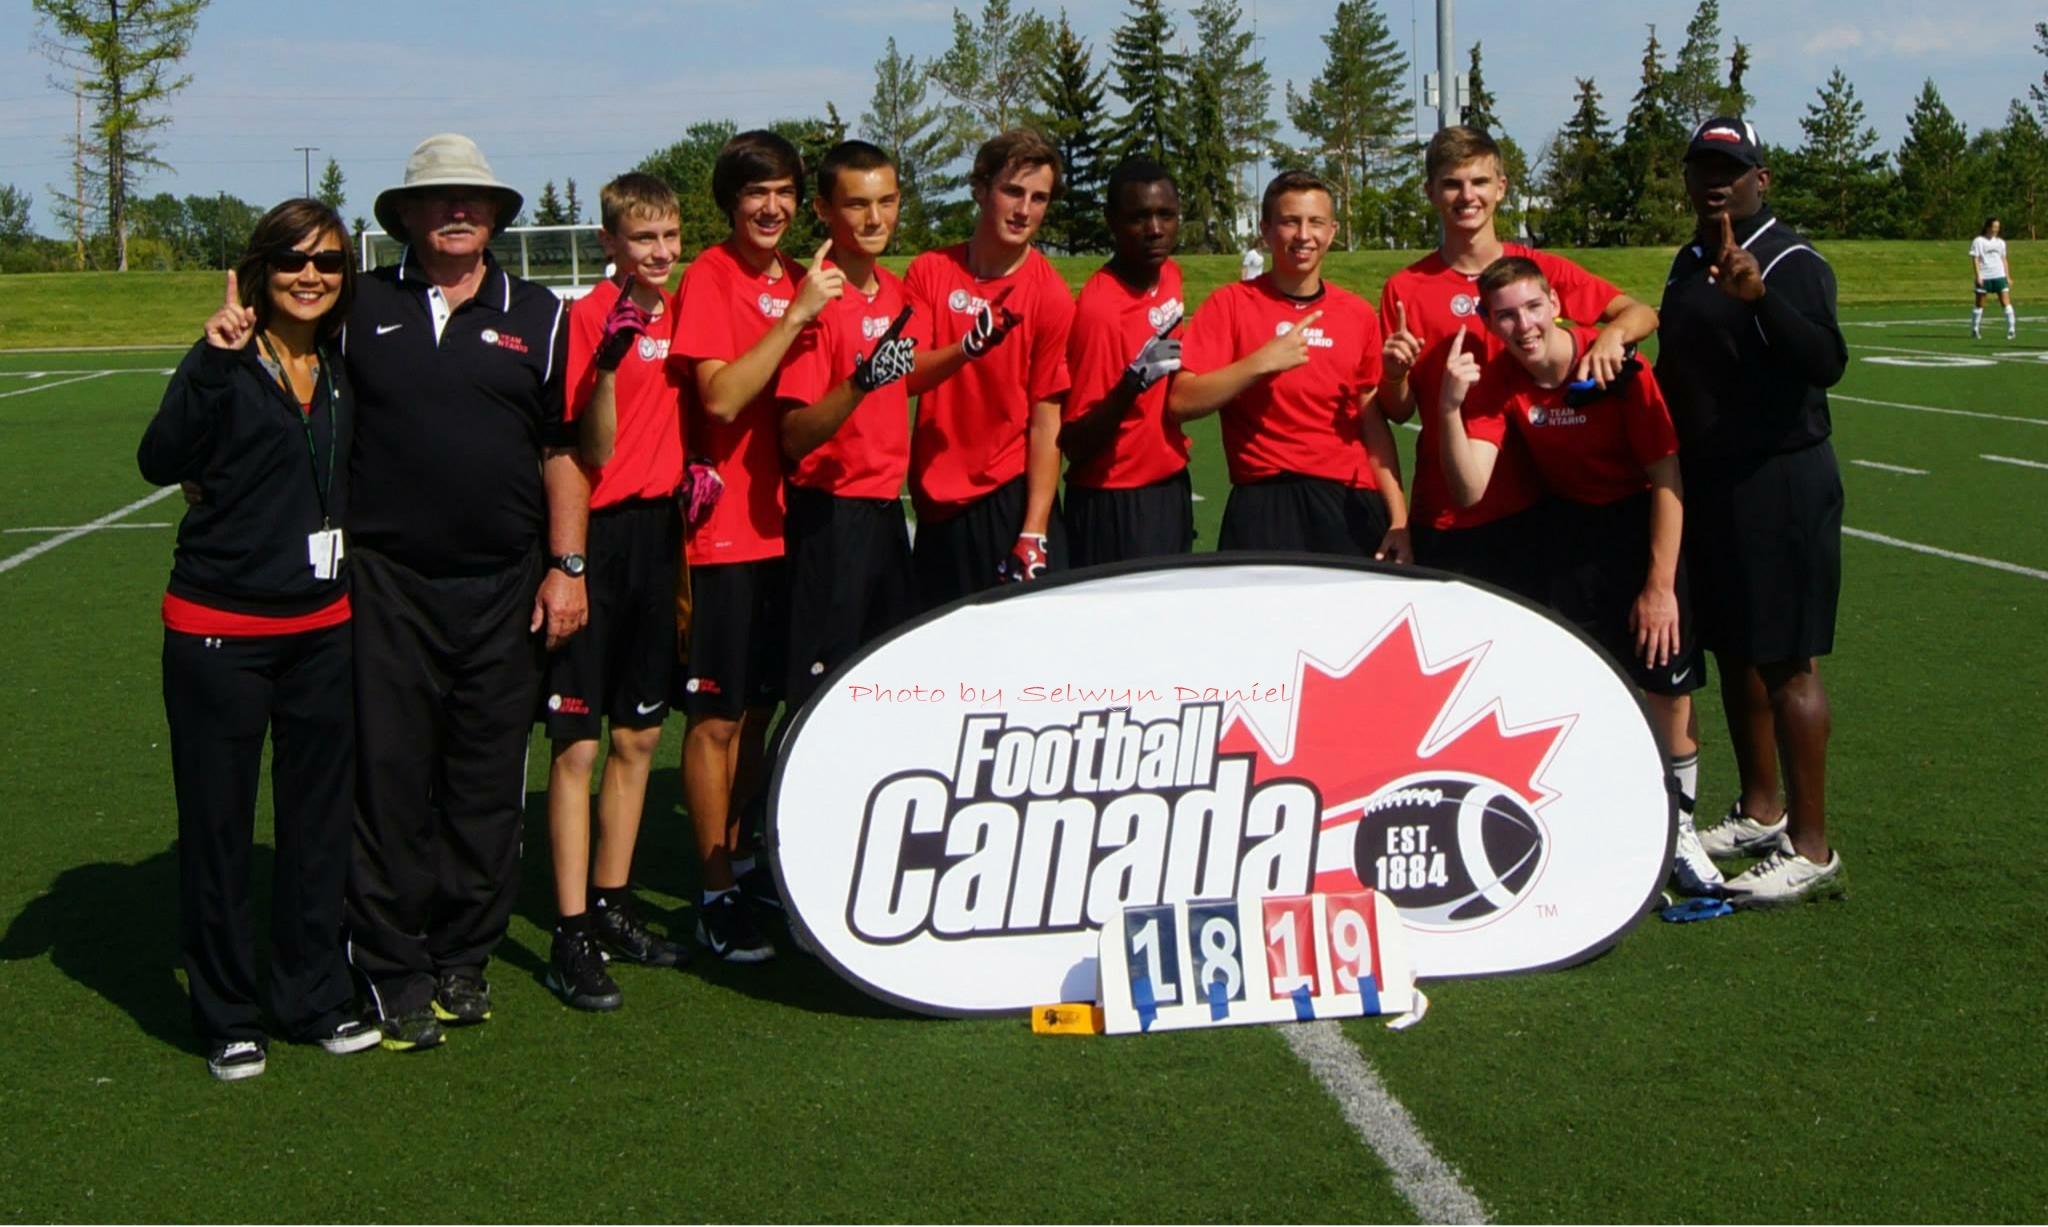 U16 Team tario – National Flag Football Champions